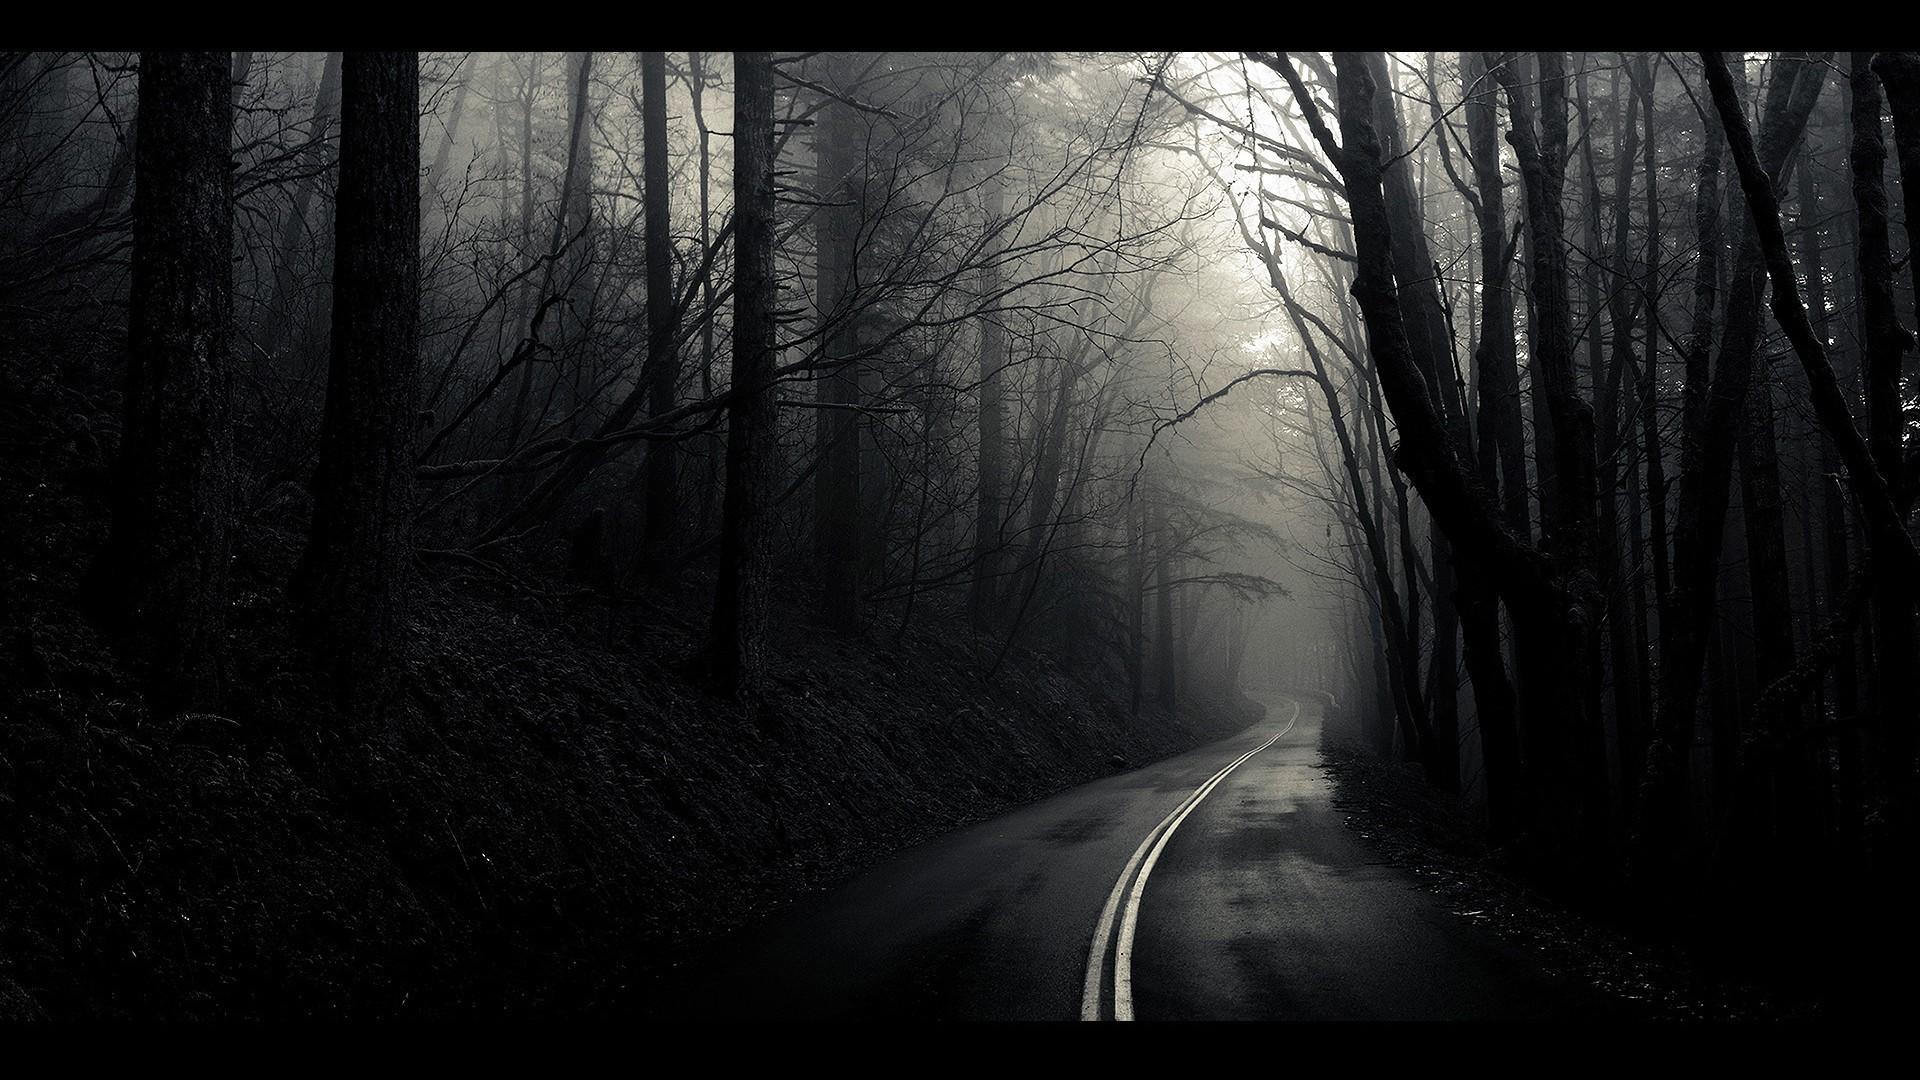 1920x1080 monochrome tag roads monochrome path landscapes mist fog white black trees beautiful nature hd desktop